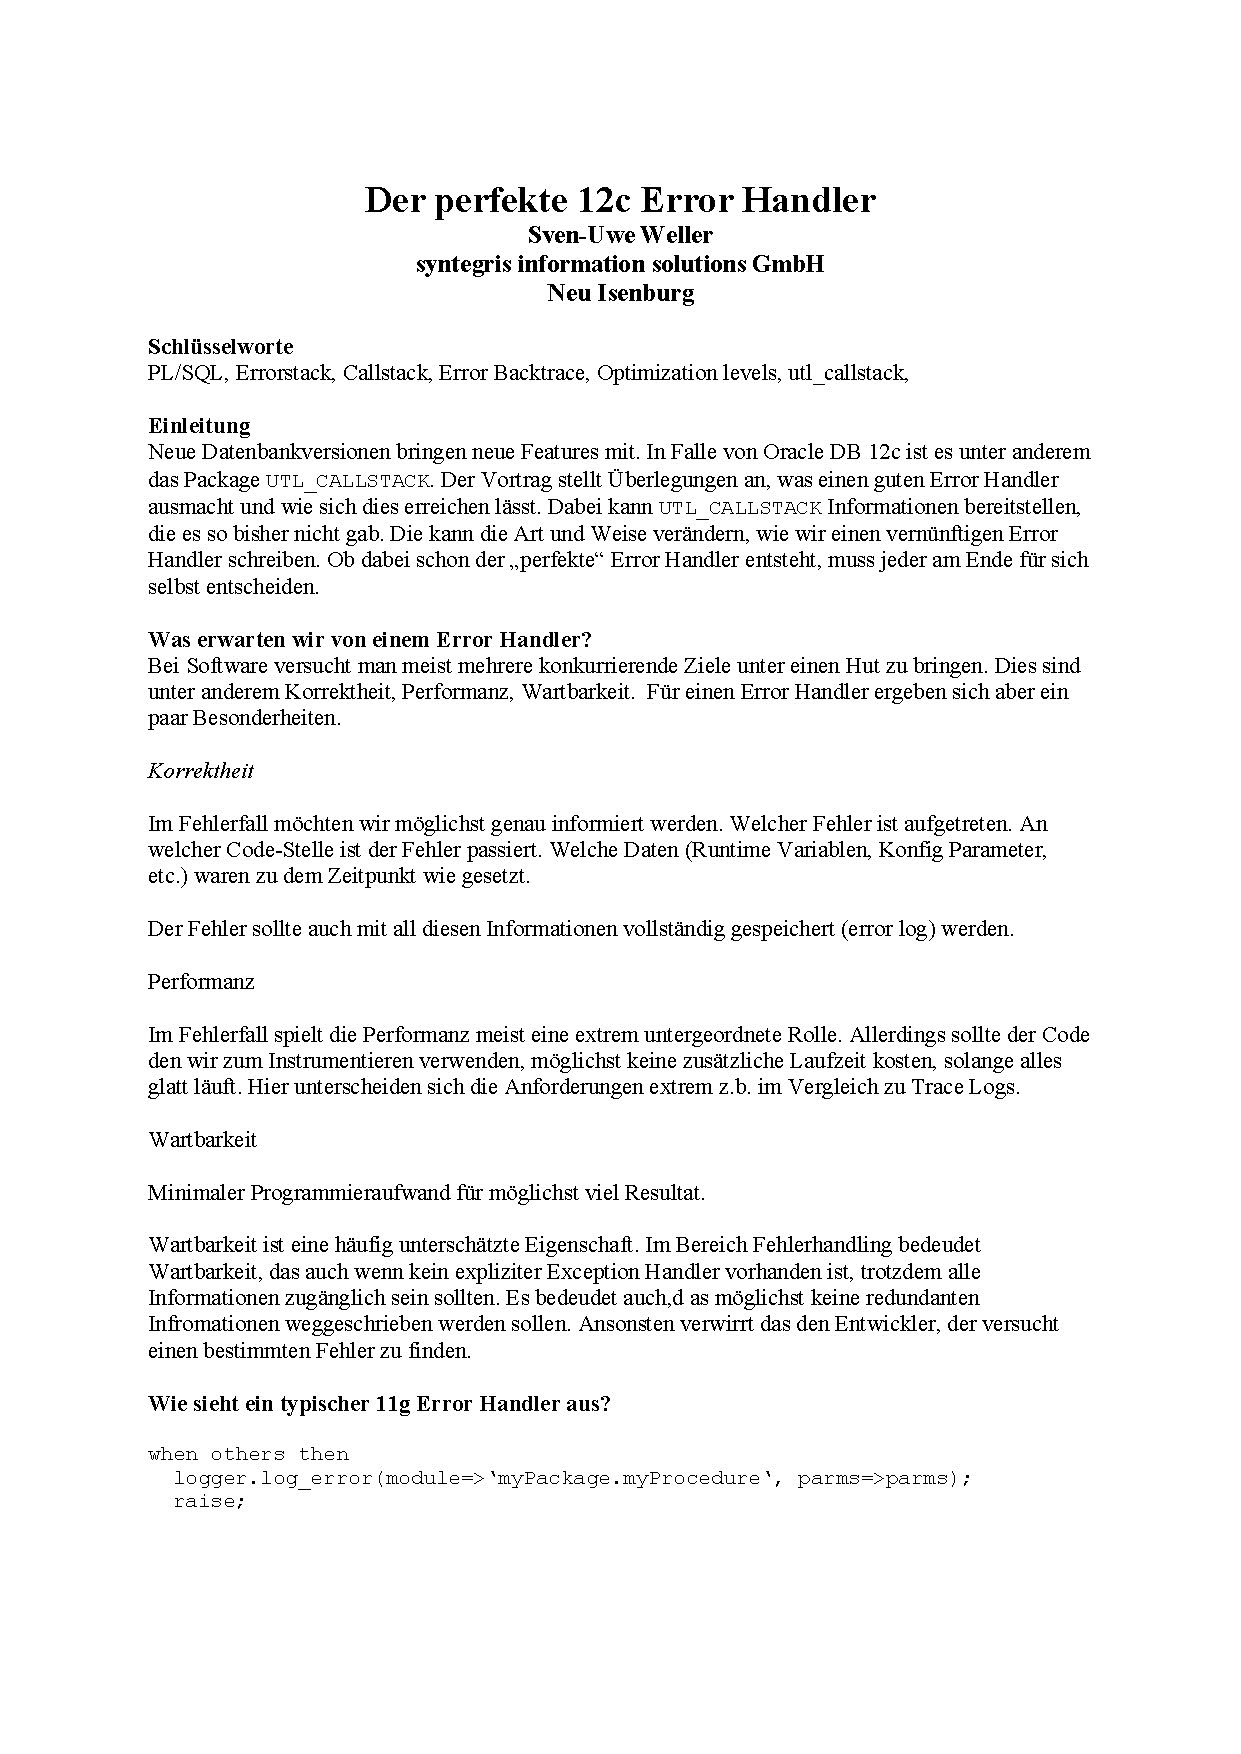 Famous Global Windsysteme Arbeitsblatt Antworten Gift - Kindergarten ...